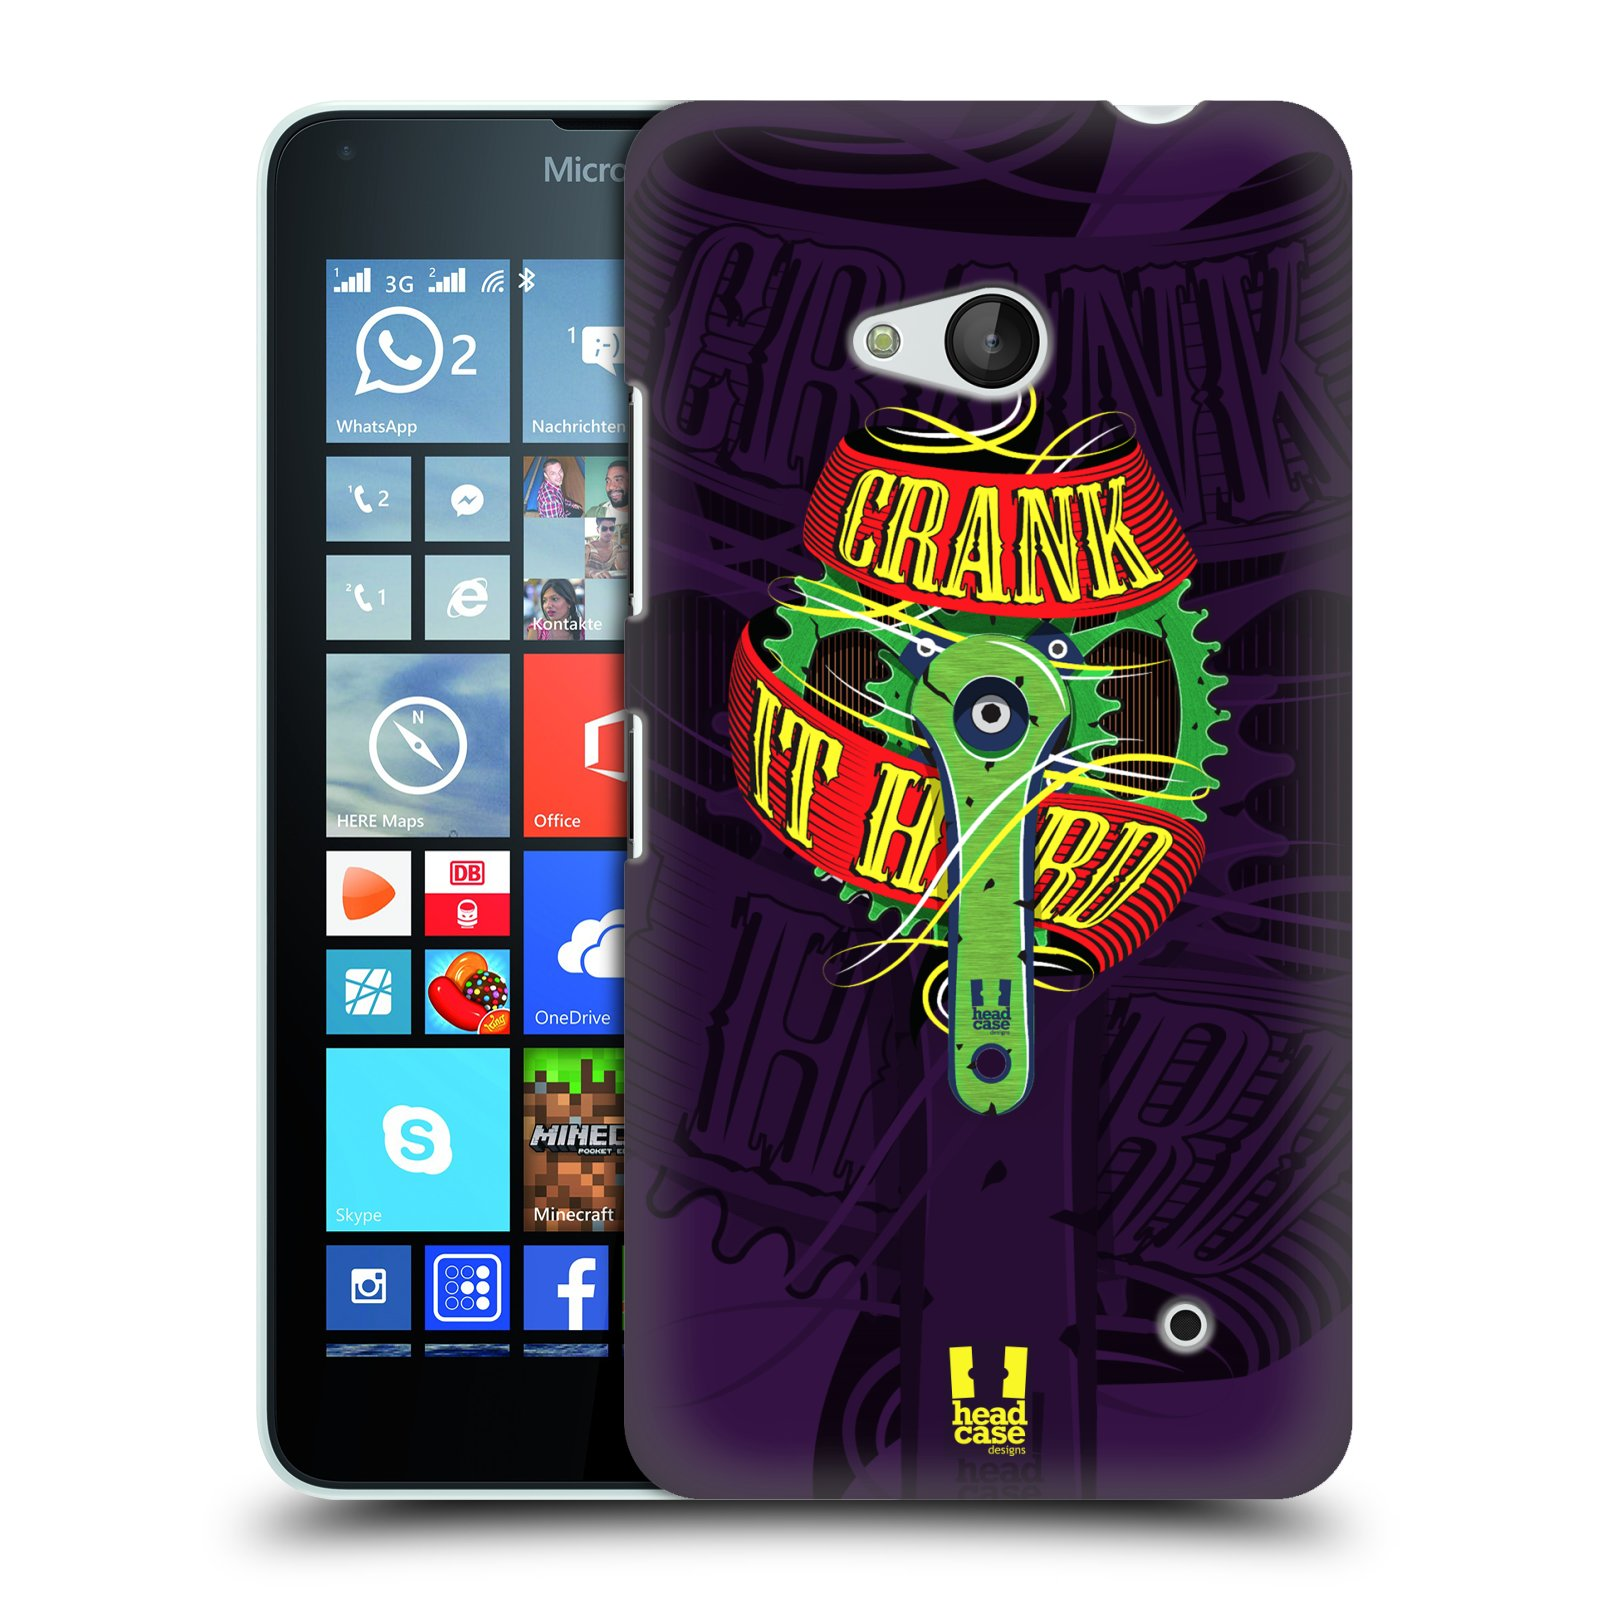 HEAD CASE plastový obal na mobil Nokia Lumia 640 Cyklista pedály šlápni do toho CRANK IT HARD